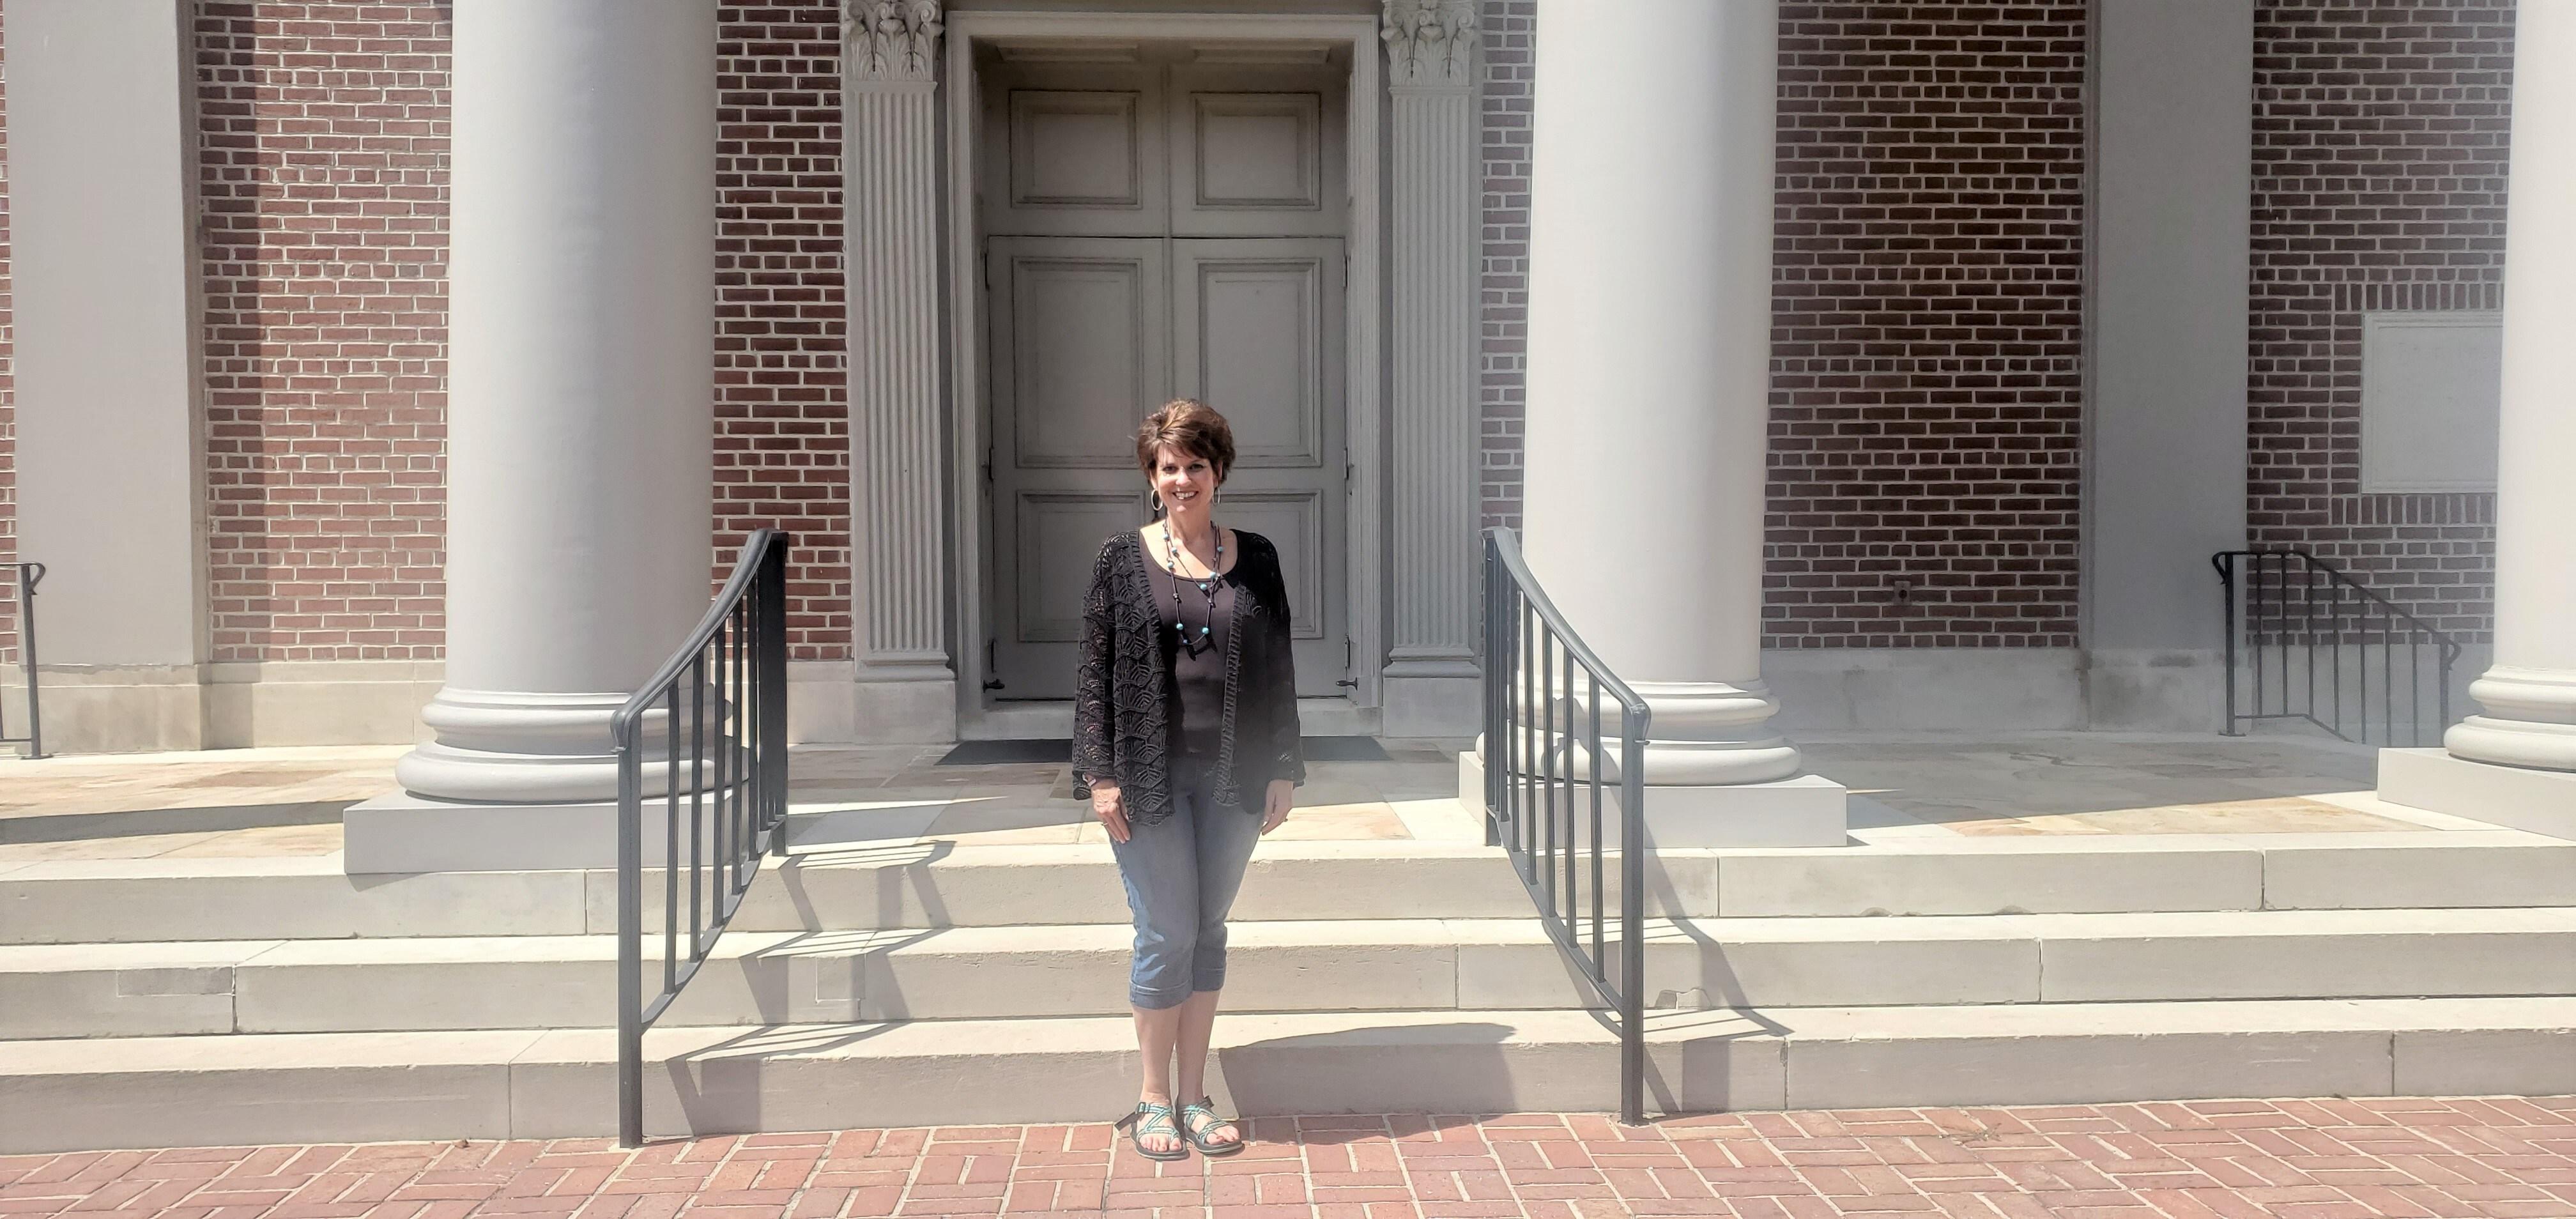 First Presbyterian Church of Wilson